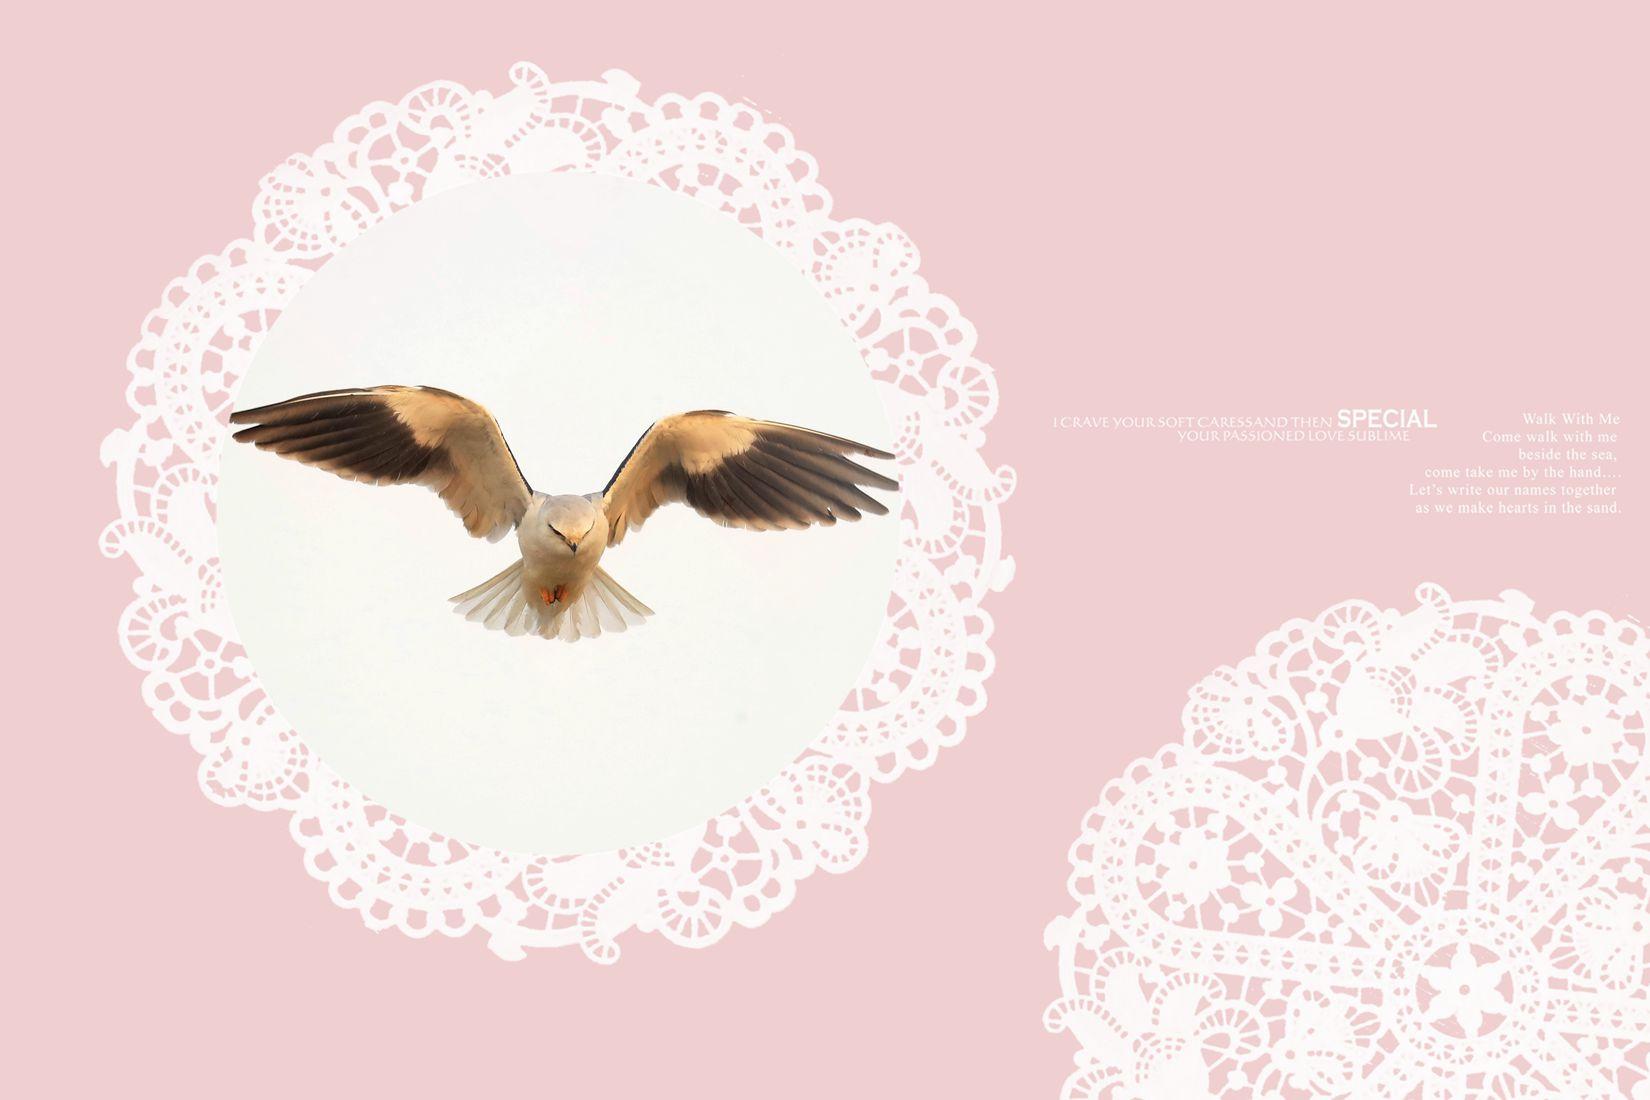 黑翅鸢、、、、、、